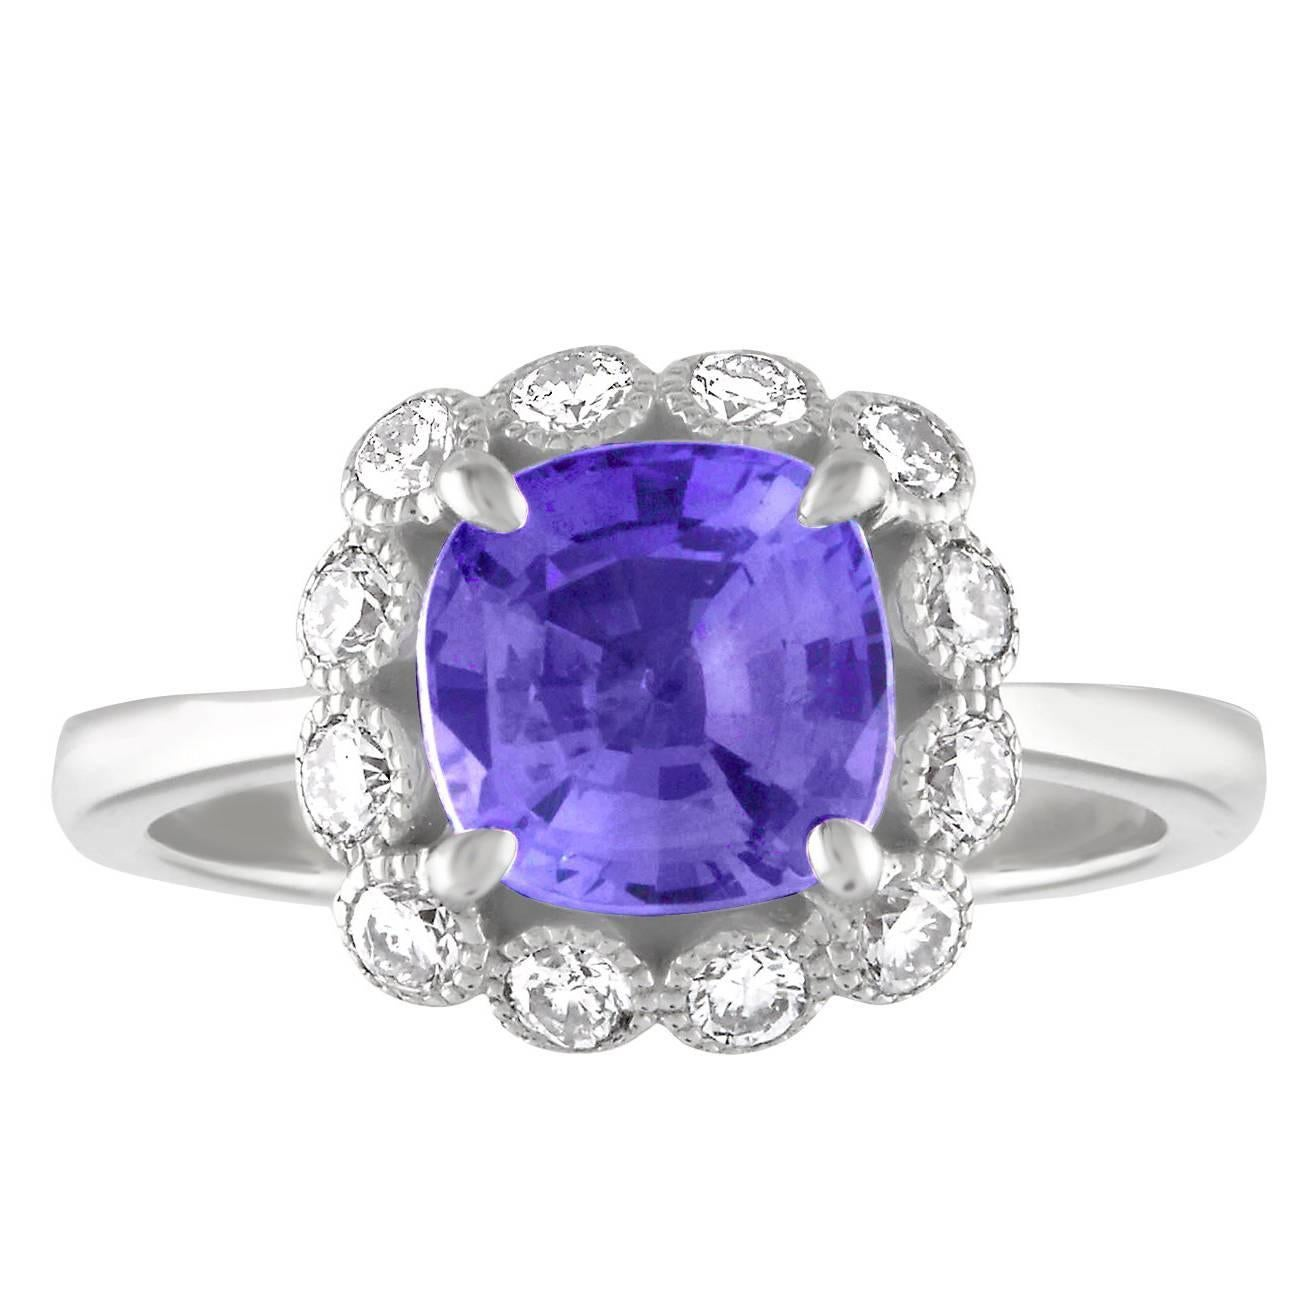 AGL Certified 2.59 Carat No Heat Violet Blue Sapphire Diamond Gold Ring